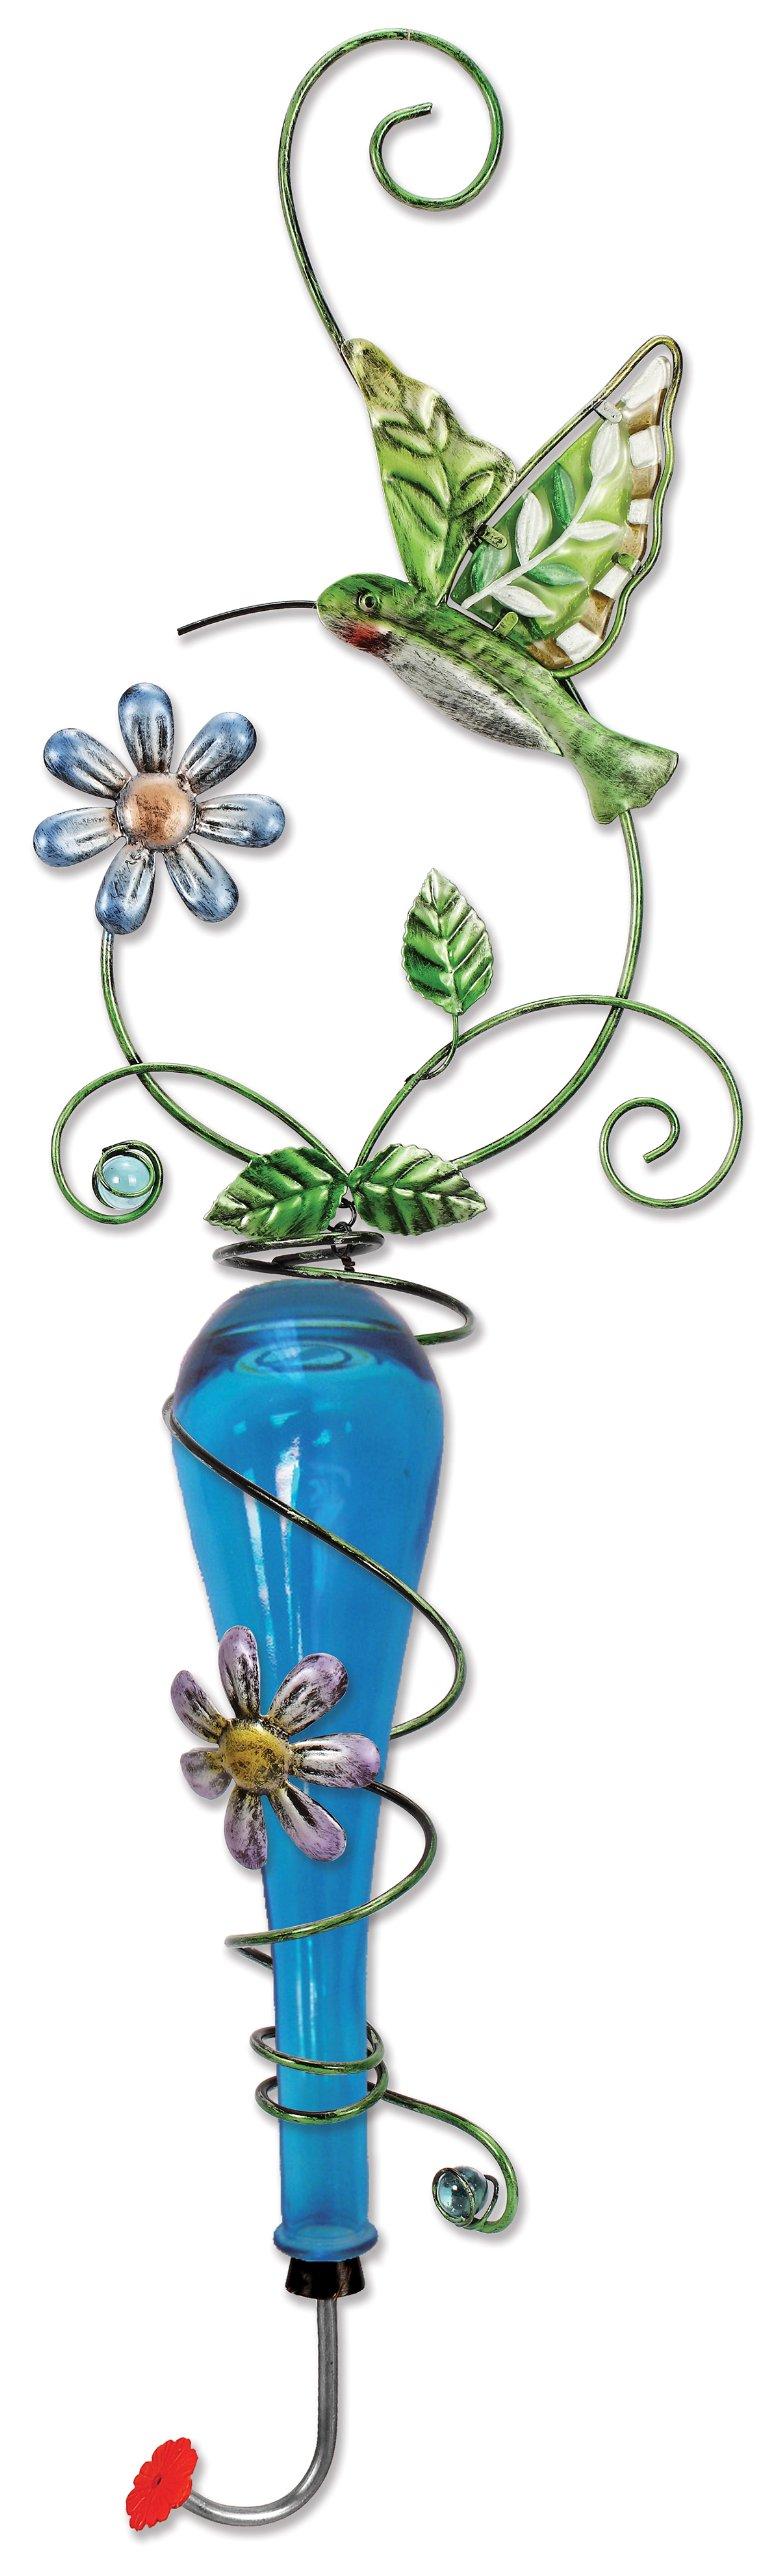 Sunset Vista Design Studios Colored Glass and Metal Hanging Hummingbird Feeder